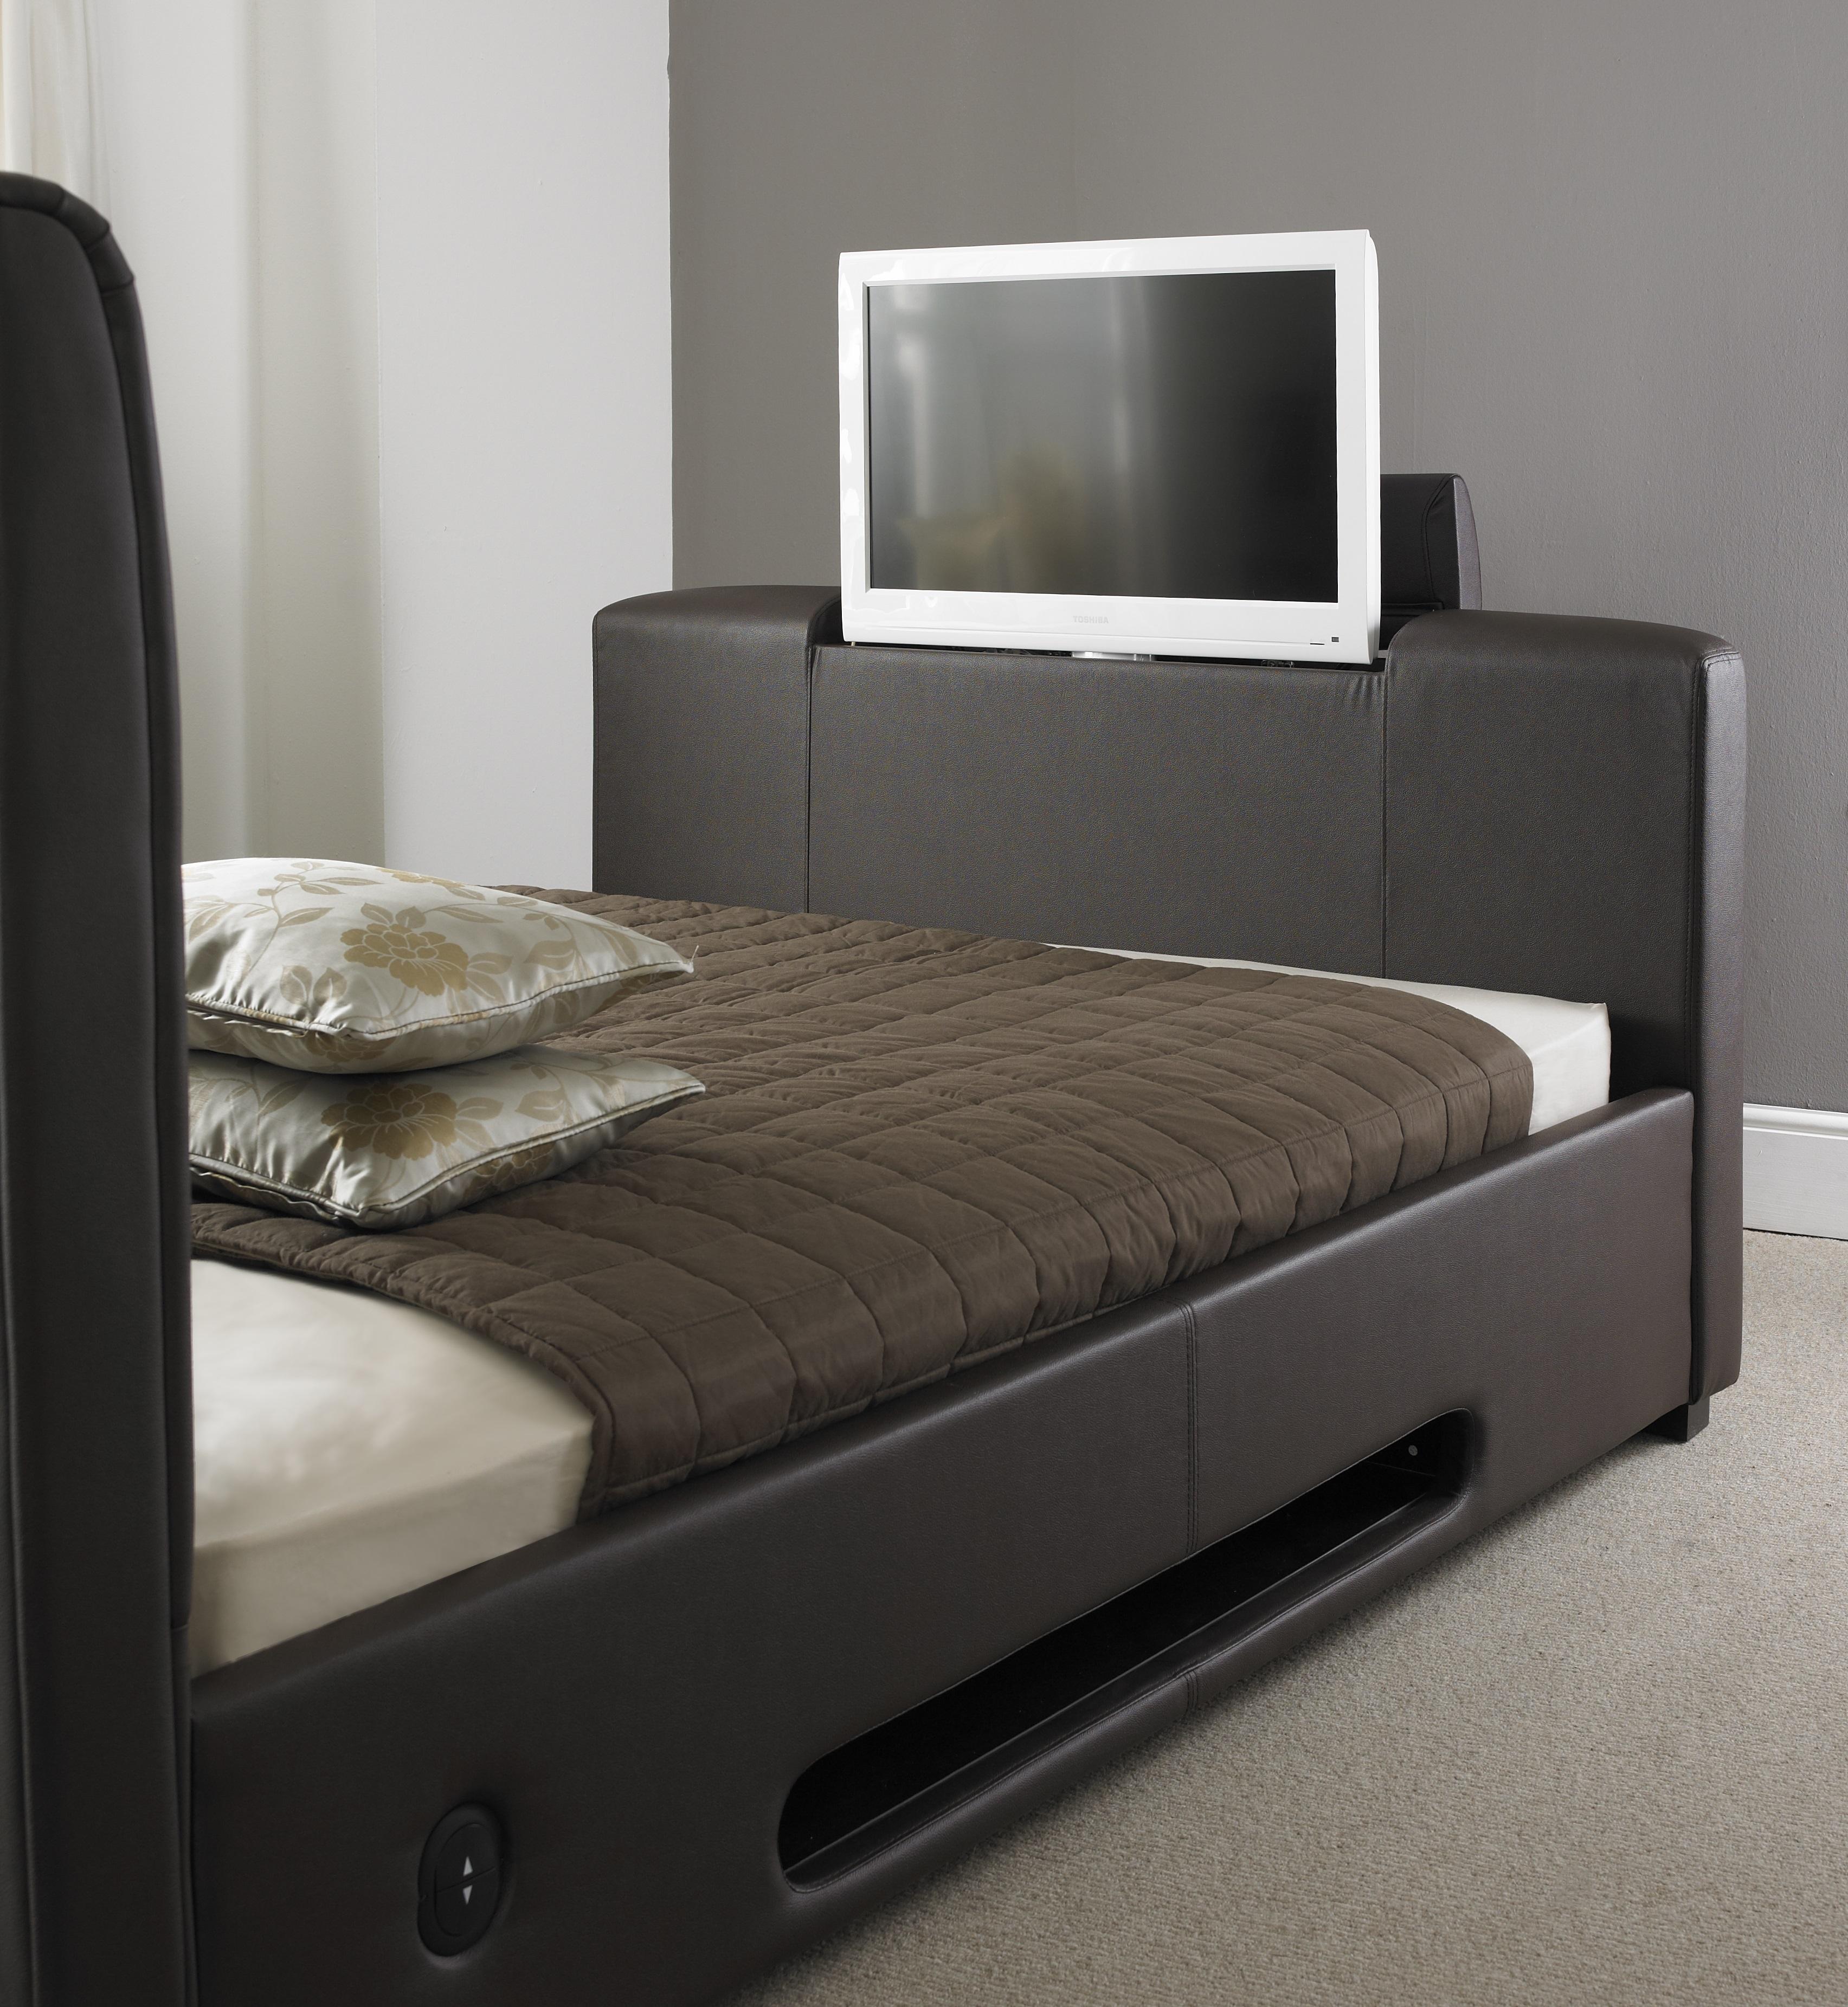 Express Brown Tv Bed 4ft6 5ft 6ft